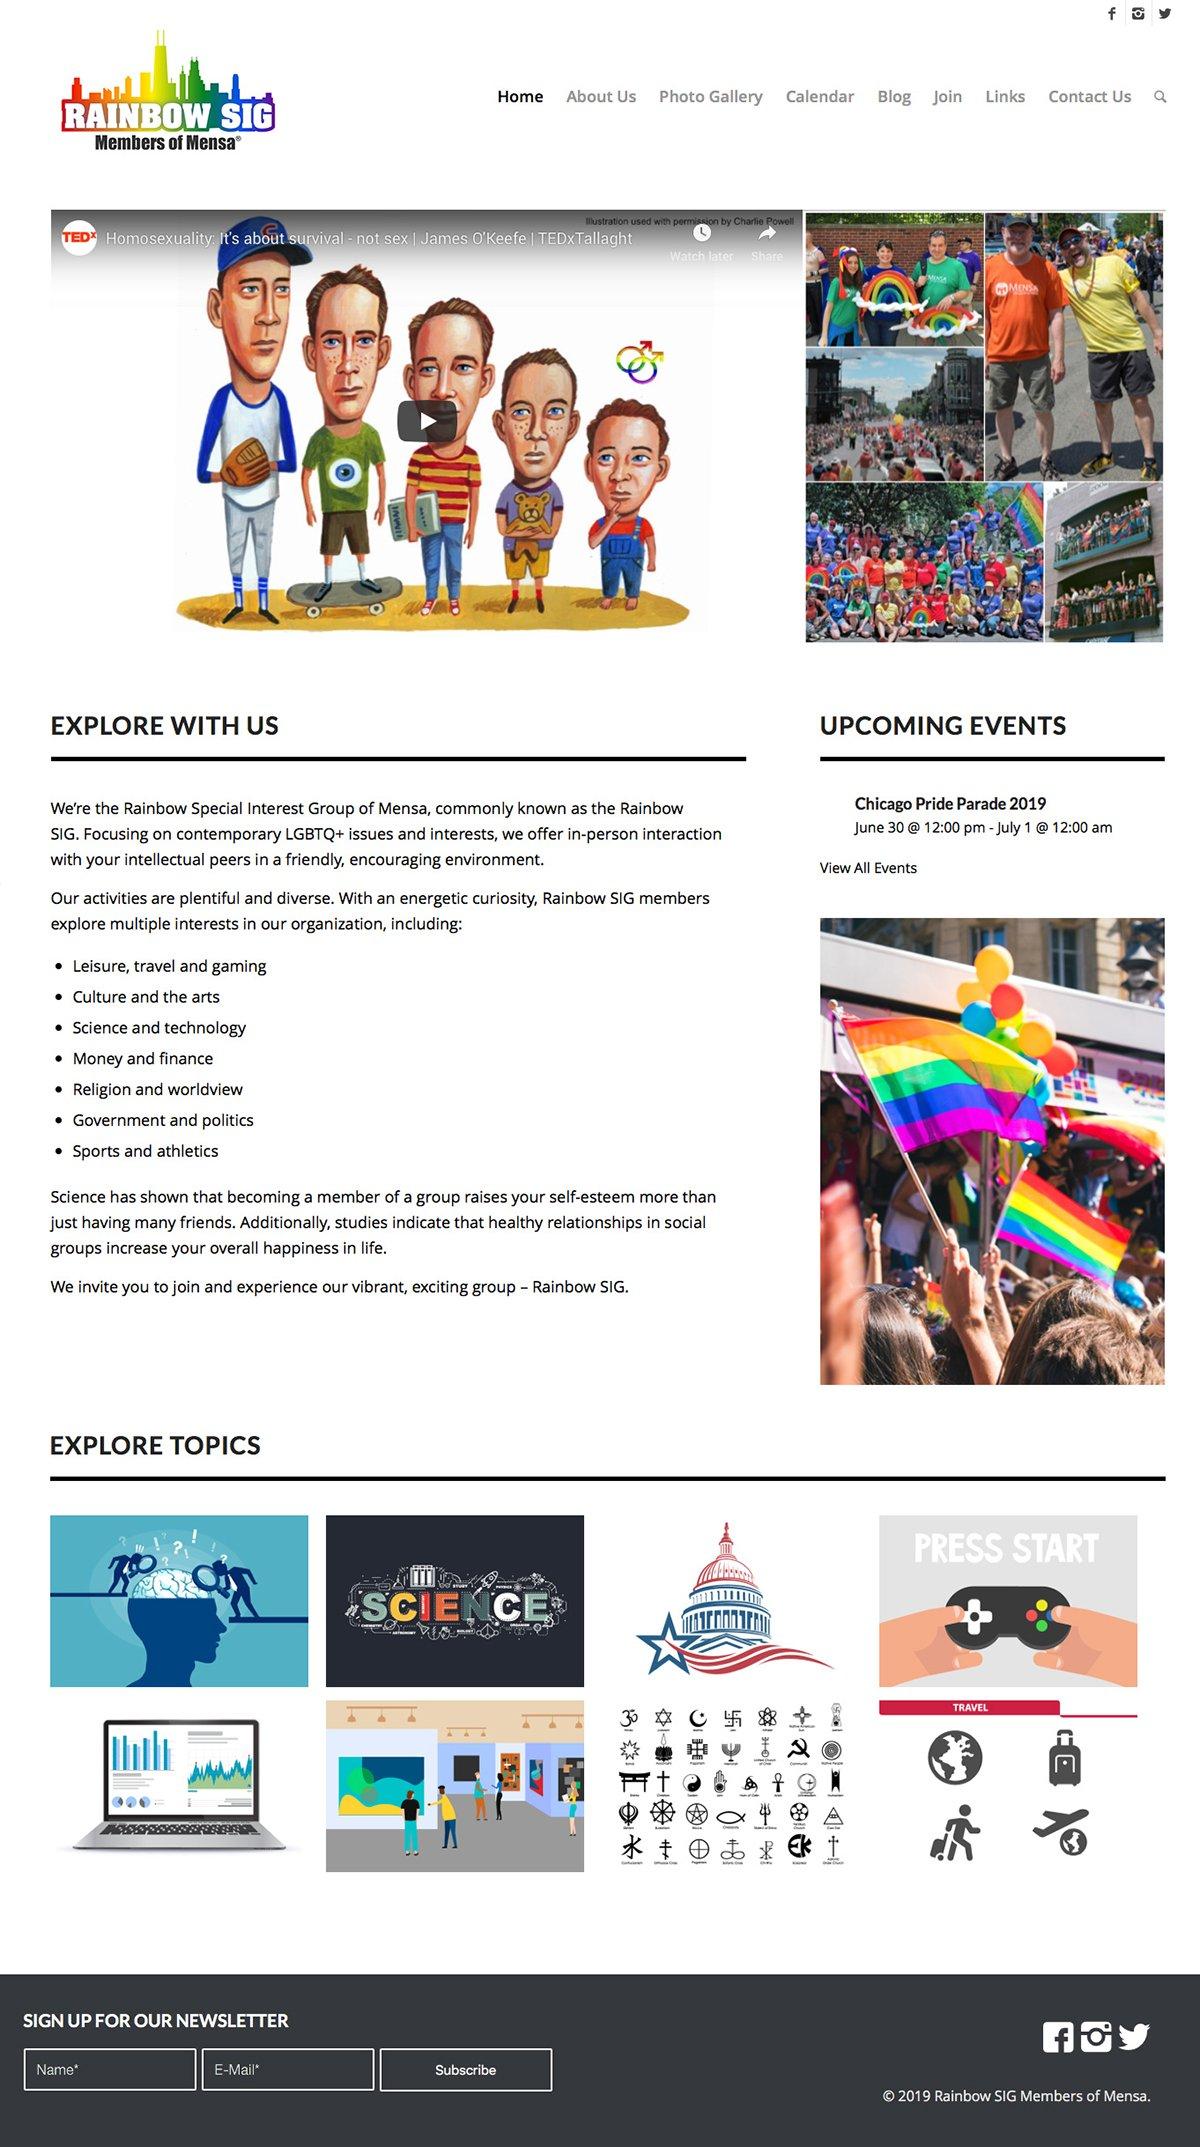 Rainbow SIG Home Page